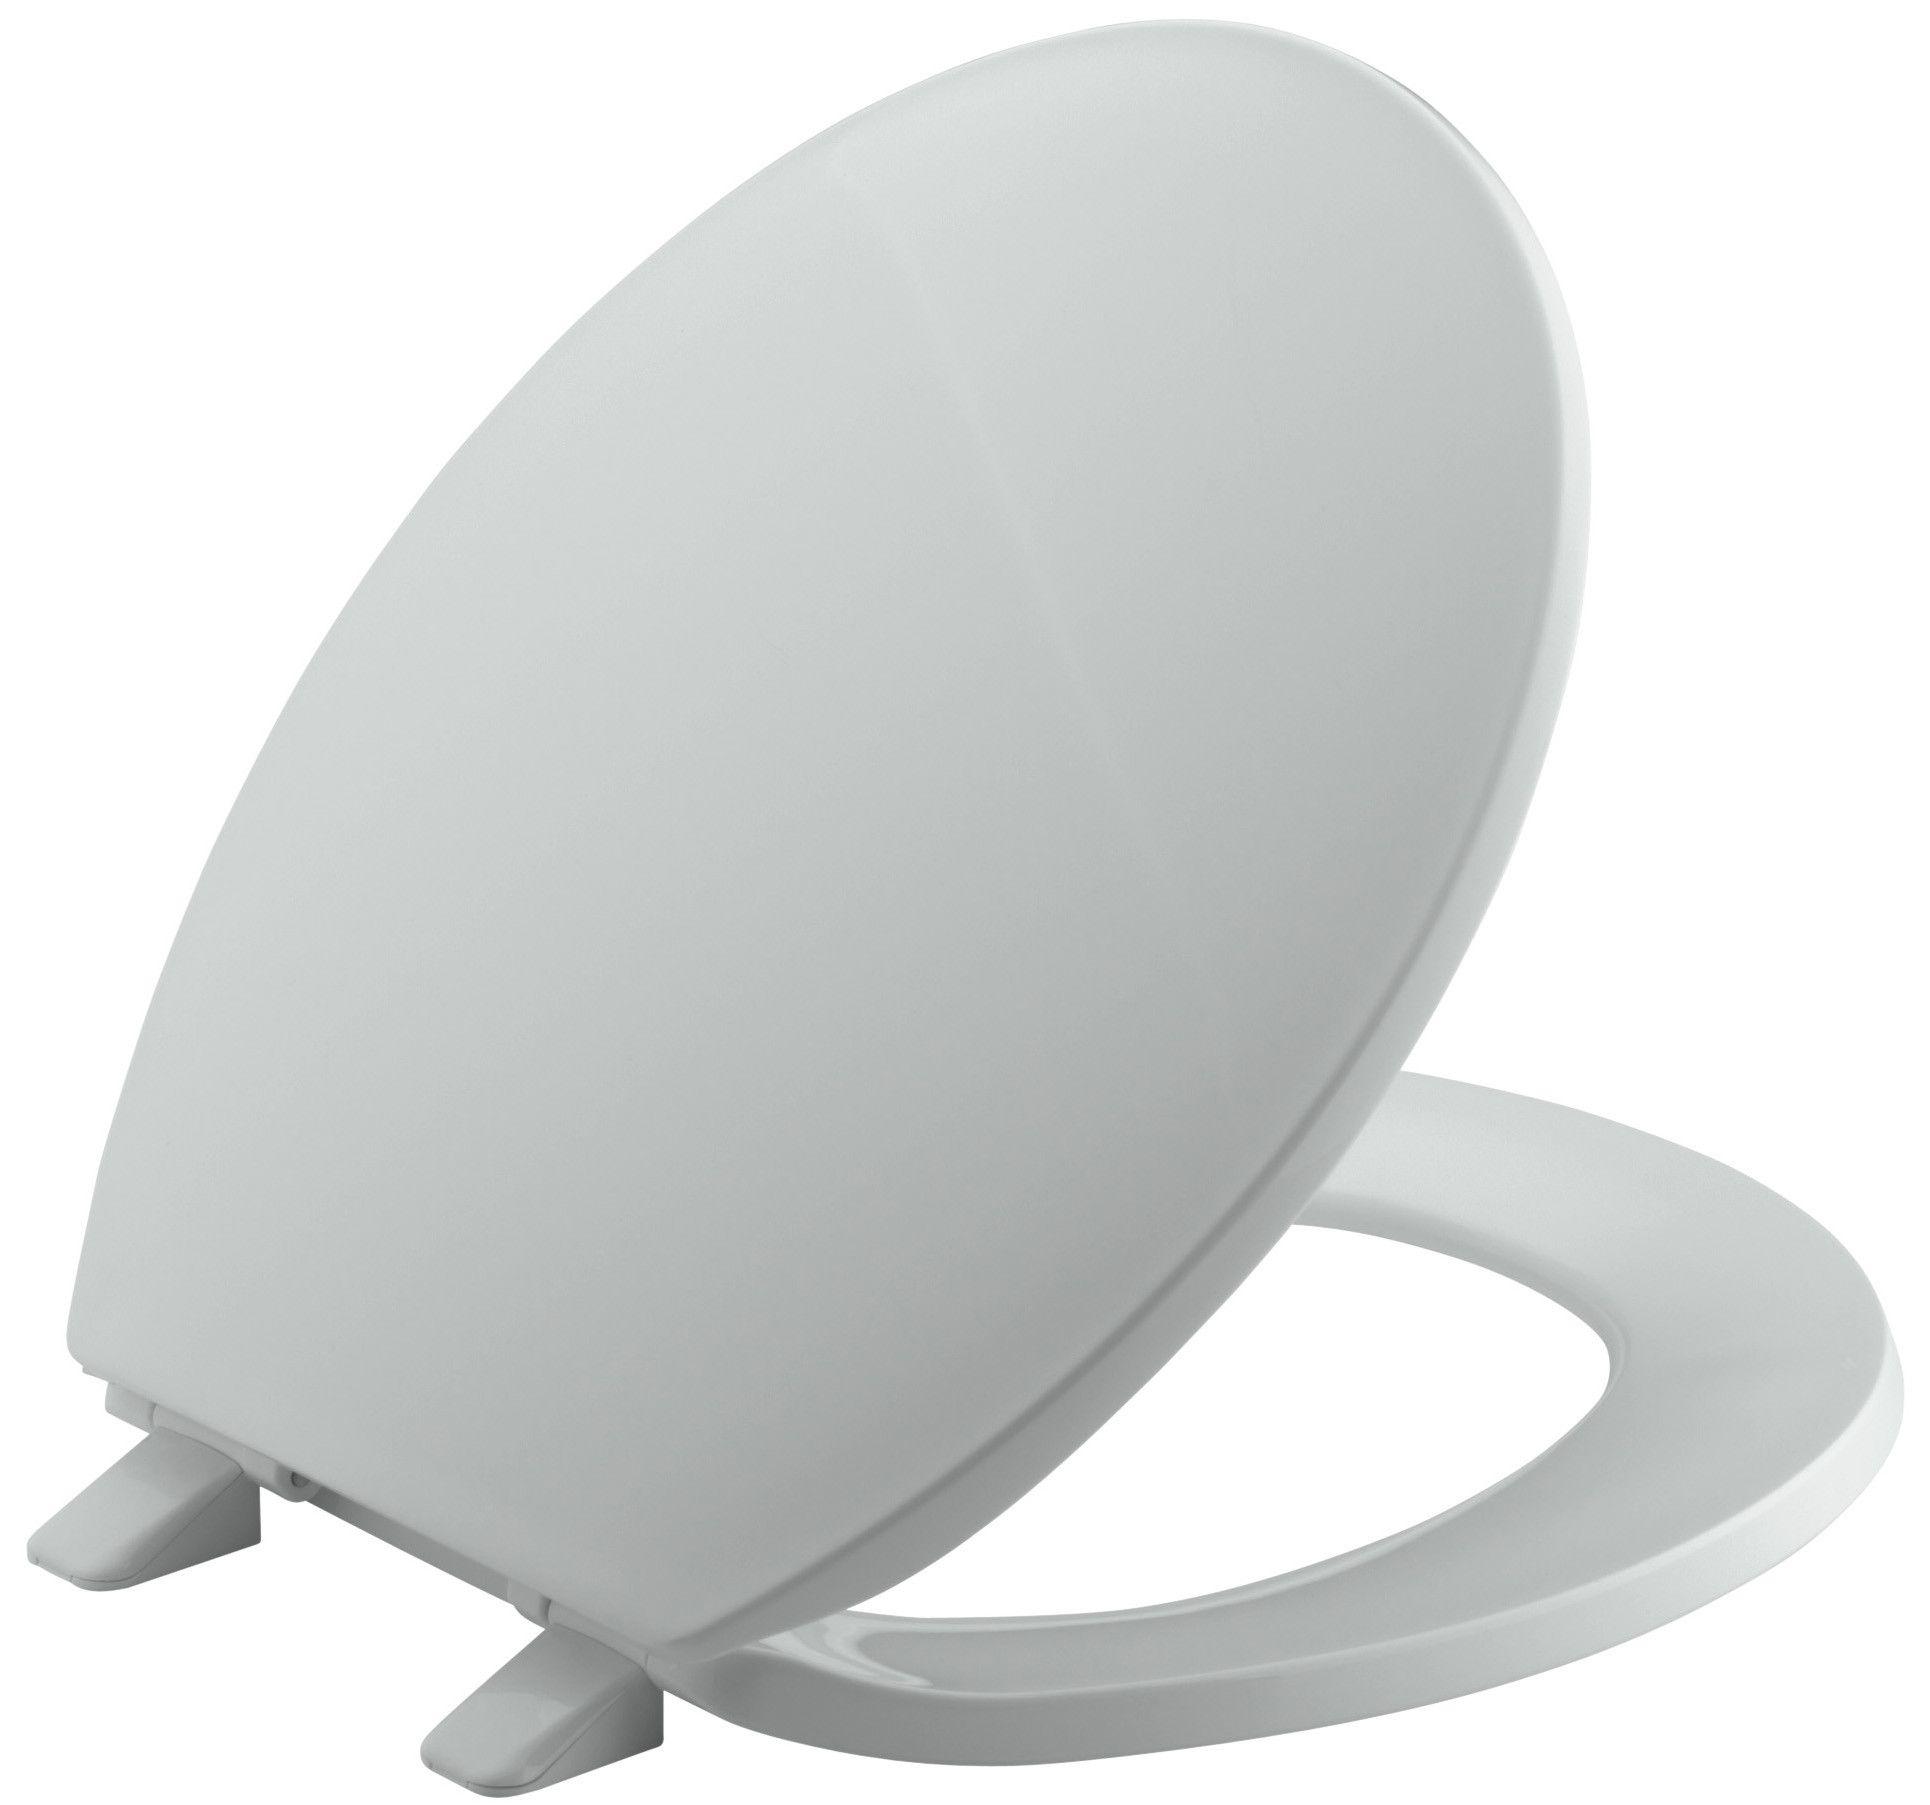 Terrific Archer Quick Release Hinges Round Front Toilet Seat Toilet Short Links Chair Design For Home Short Linksinfo